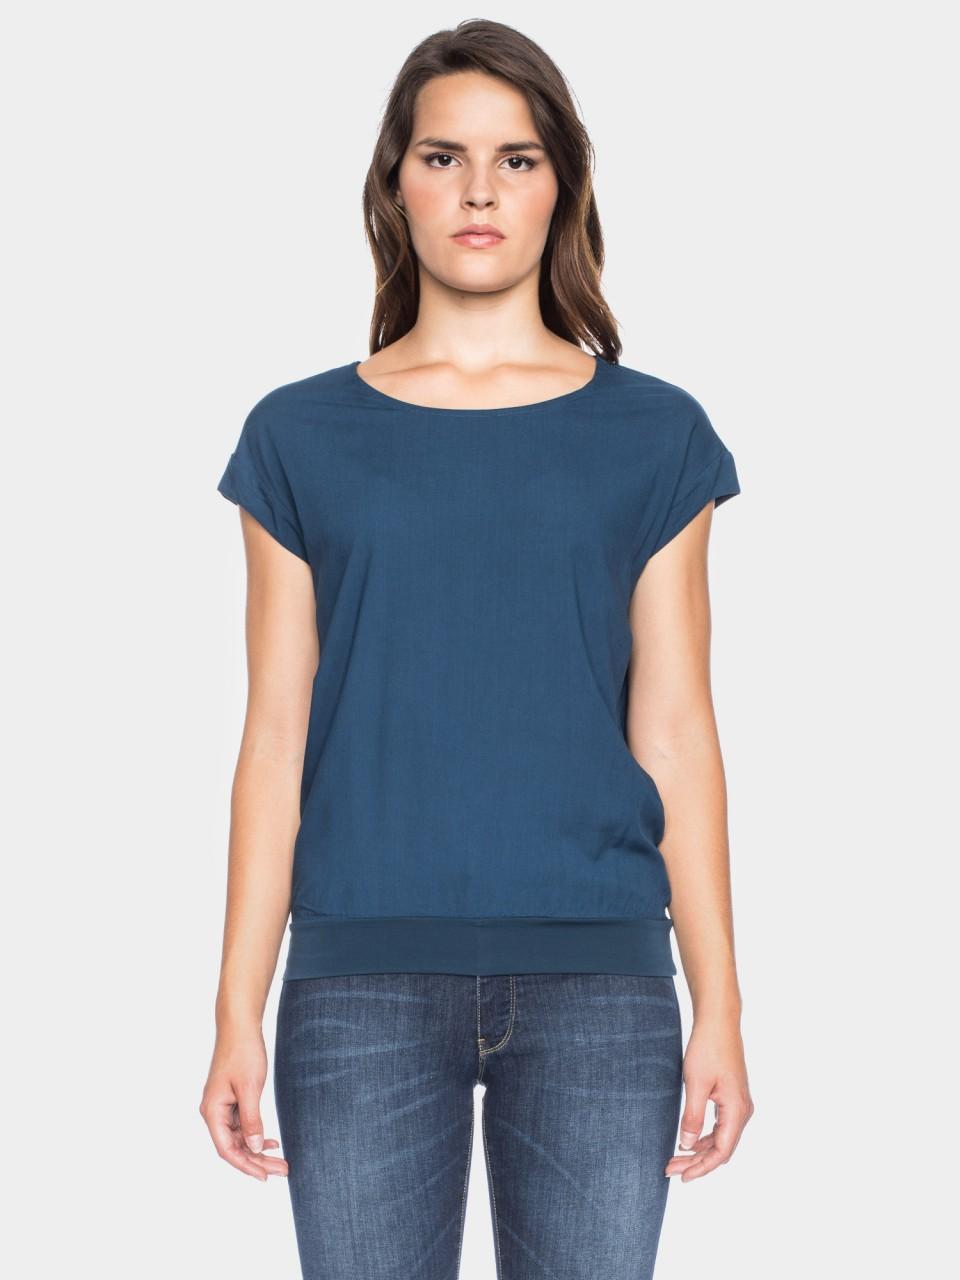 Shirt Leo CV 14/034 MOON